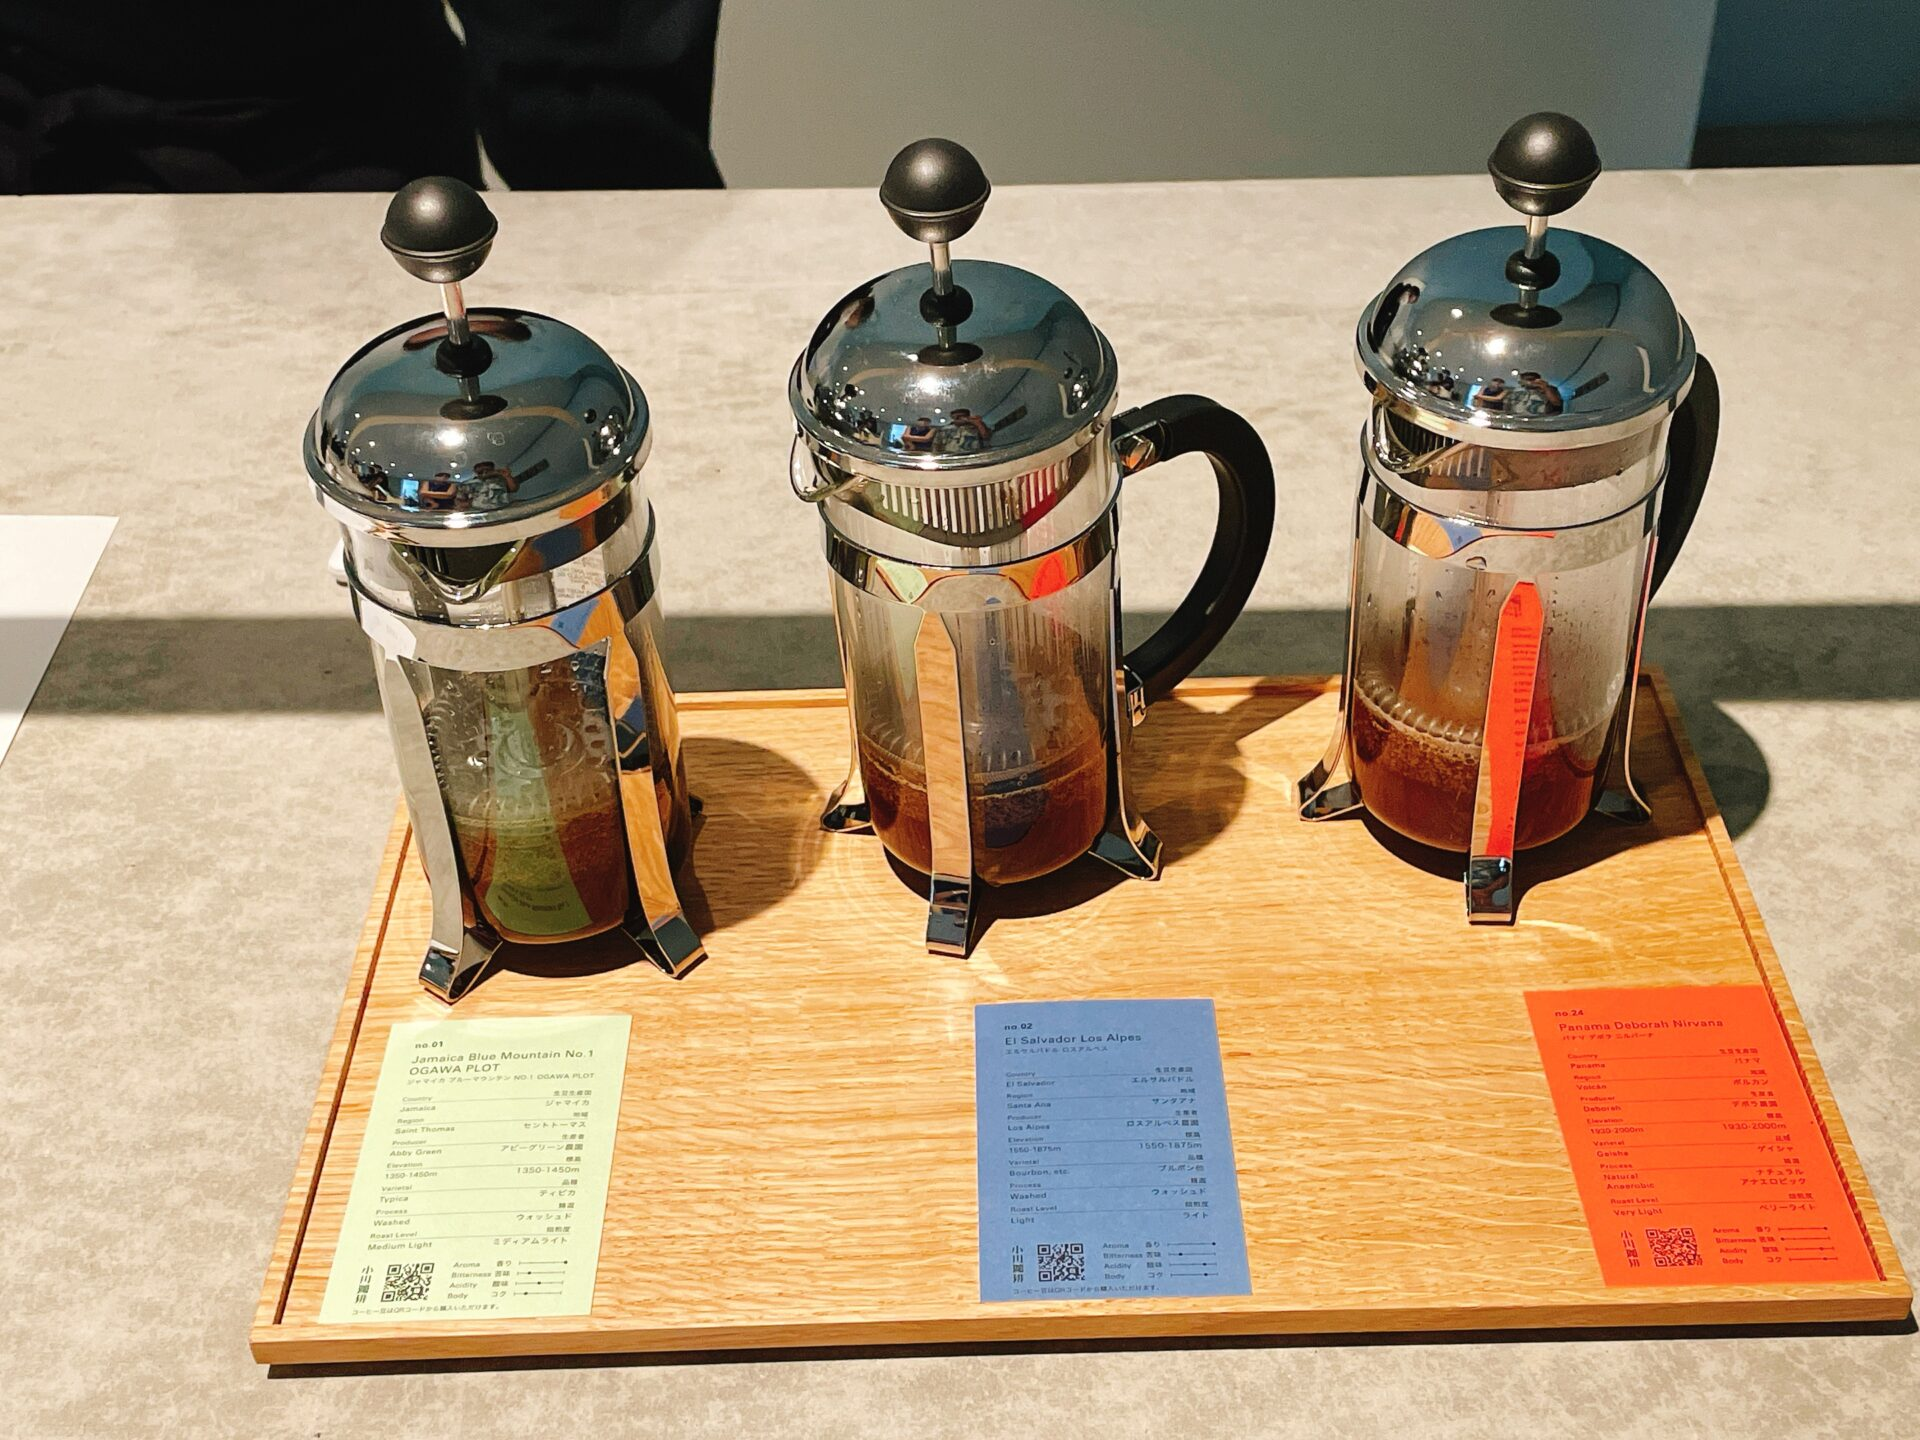 OGAWA COFFEE LABORATORY 下北沢店のフレンチプレス